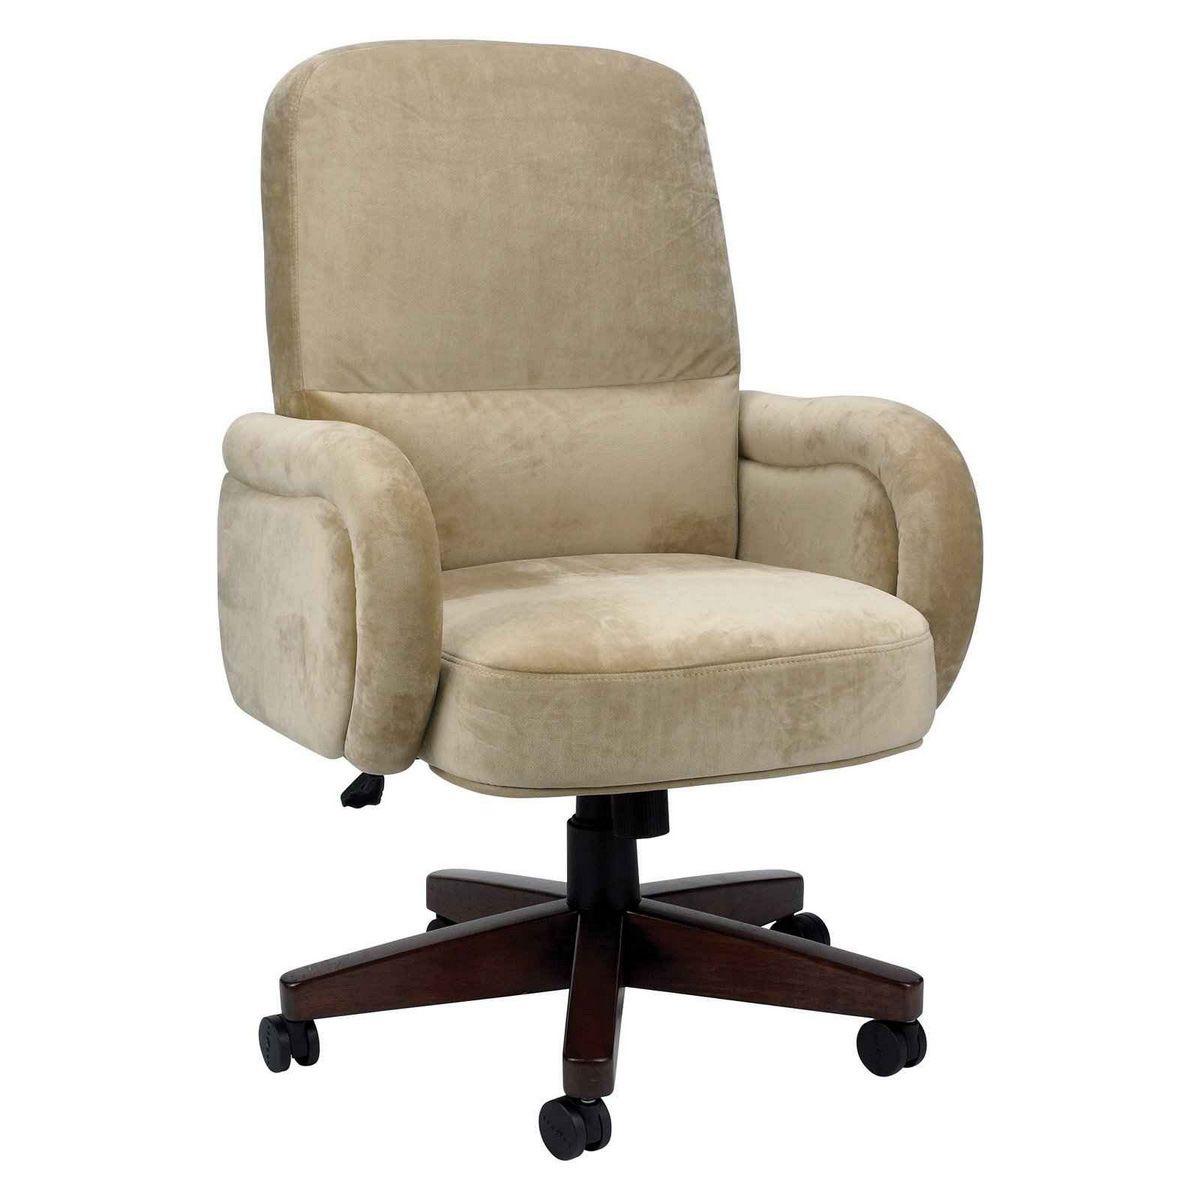 Komfortable Computer Stuhl | Stühle | Pinterest